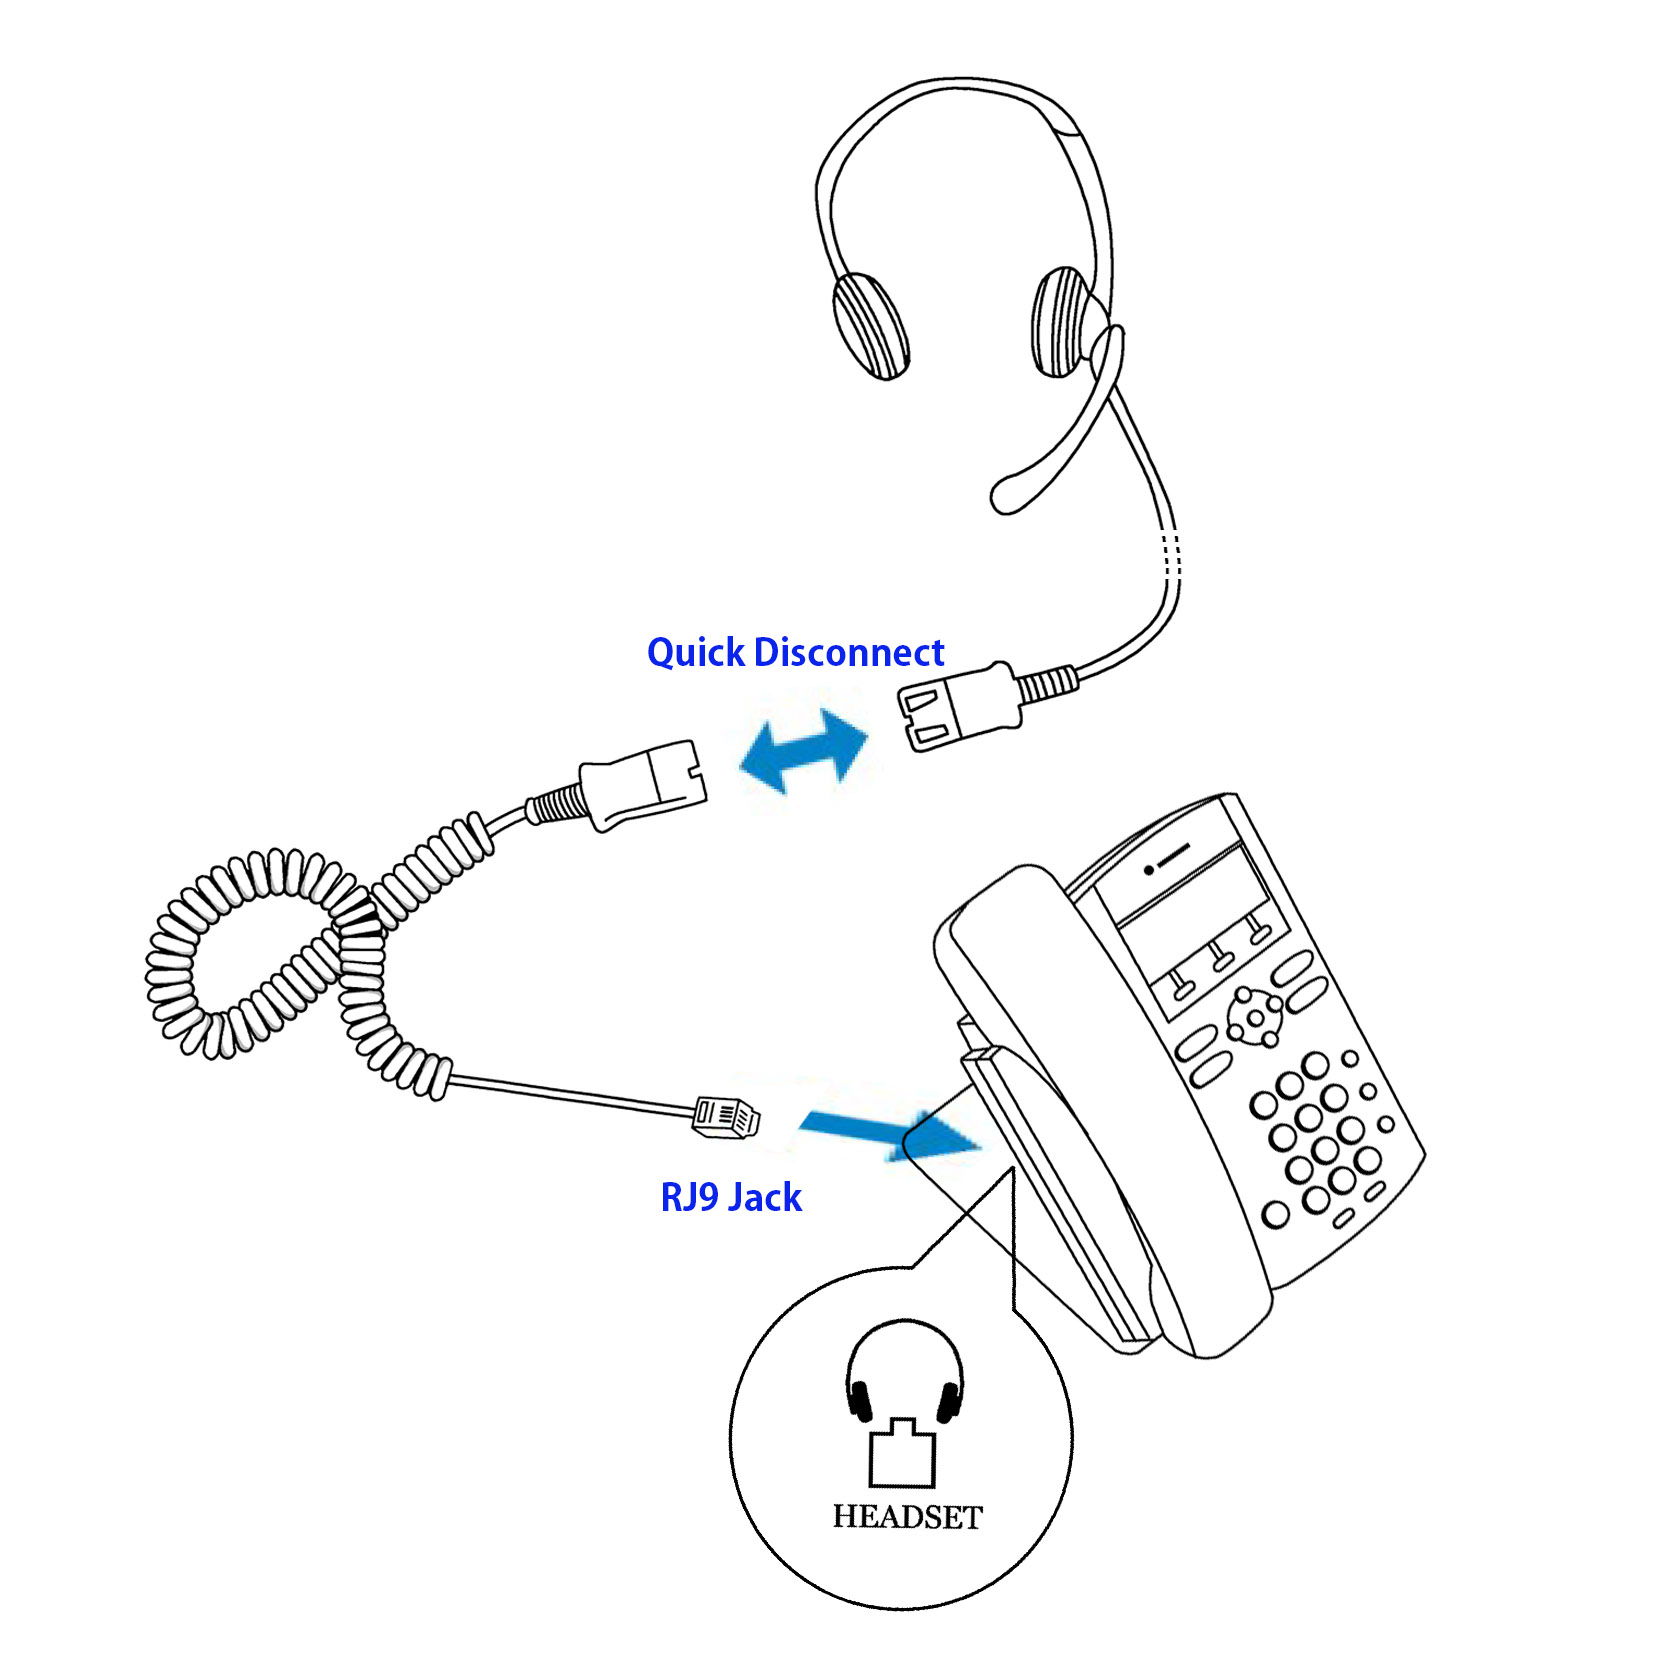 Cisco Cisco Cius, CTS500 Cisco 12 VIP, 30 VIP Phone Headset - Voice Tube  Pro Binaural Headset + RJ9 Cisco Headset Adapter as Office Headset -  Walmart.com